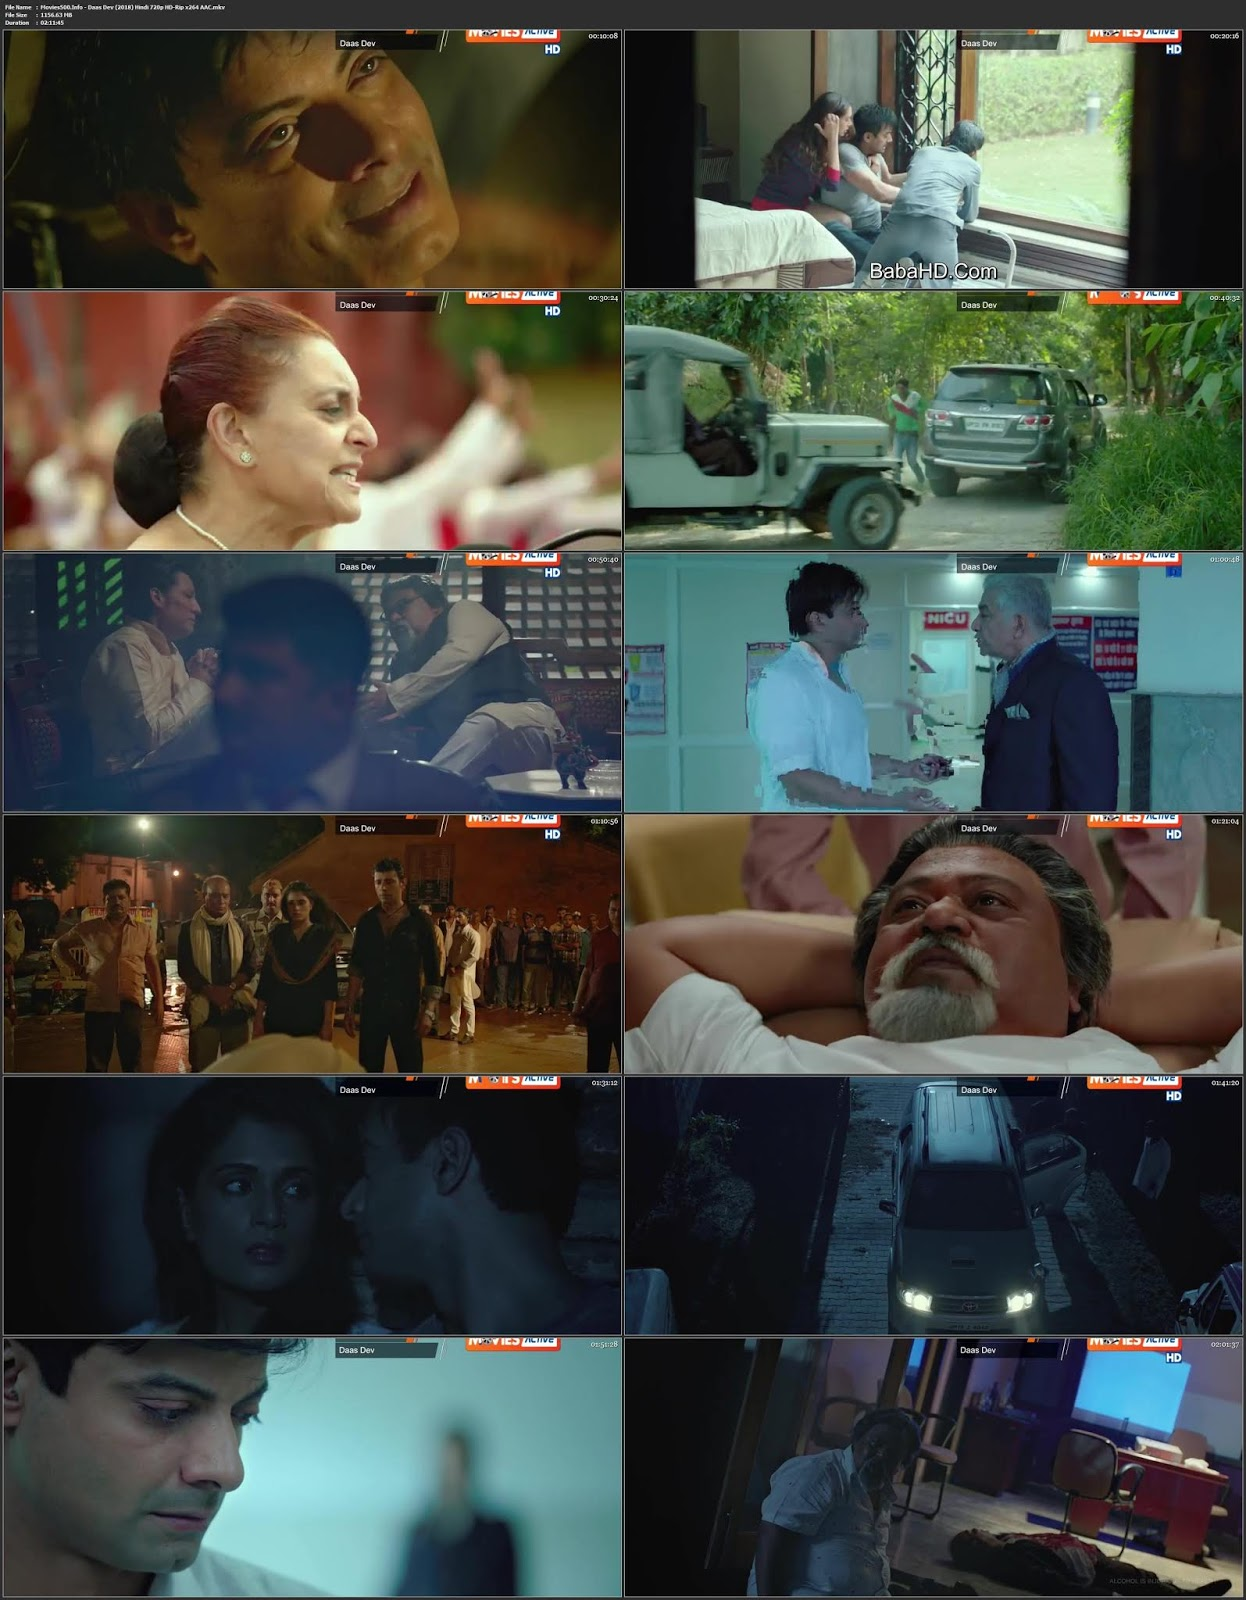 Daas Dev 2018 Hindi Full Movie HDTVRip 720p 1.2GB